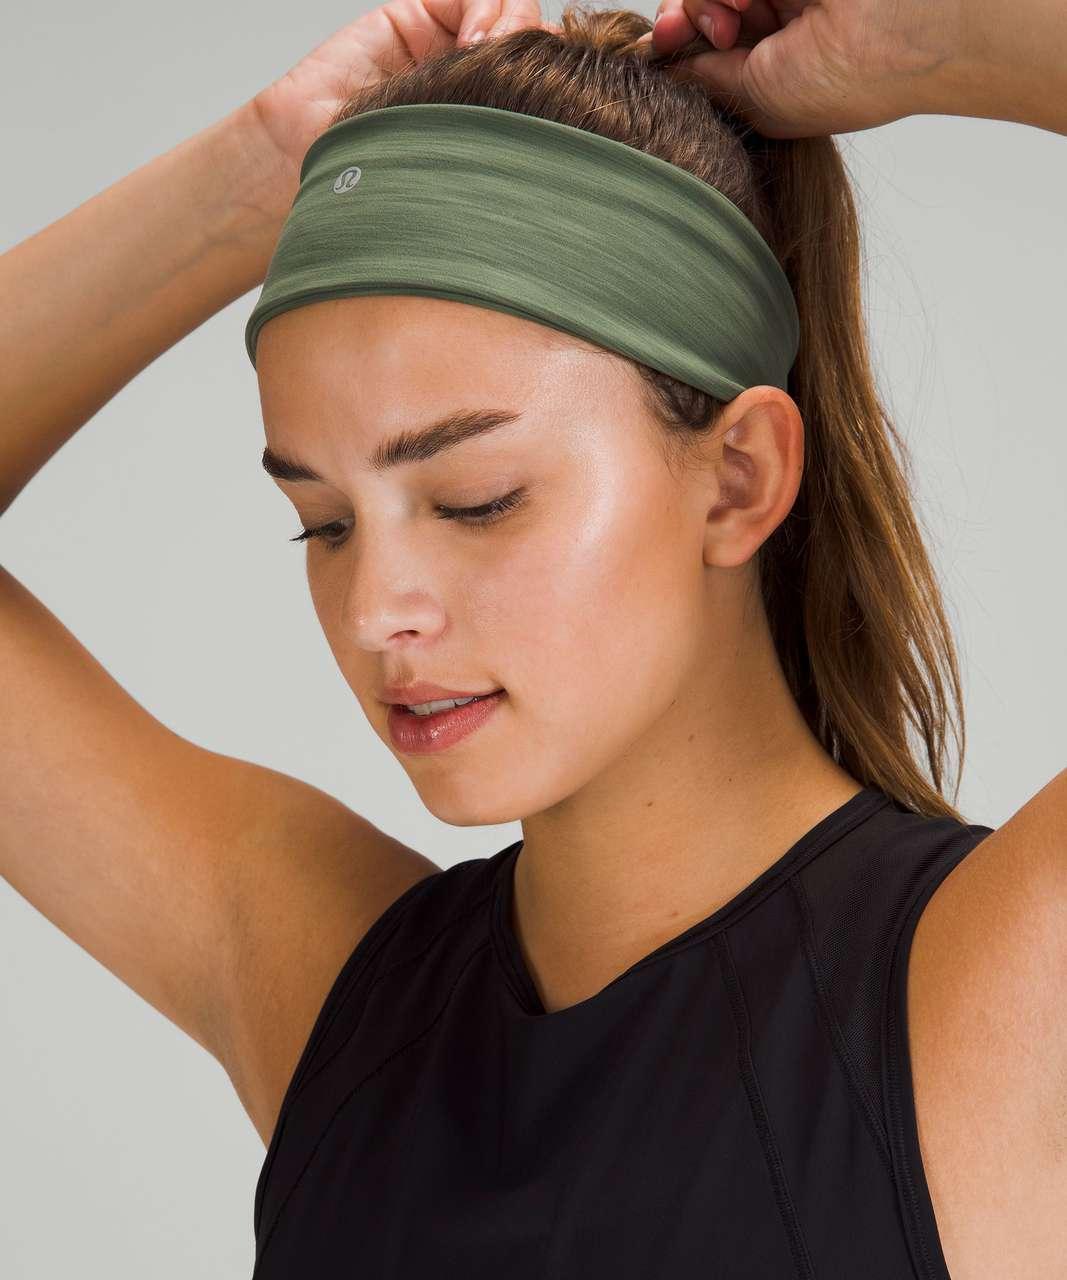 Lululemon Wunder Train Headband - Heathered Green Twill